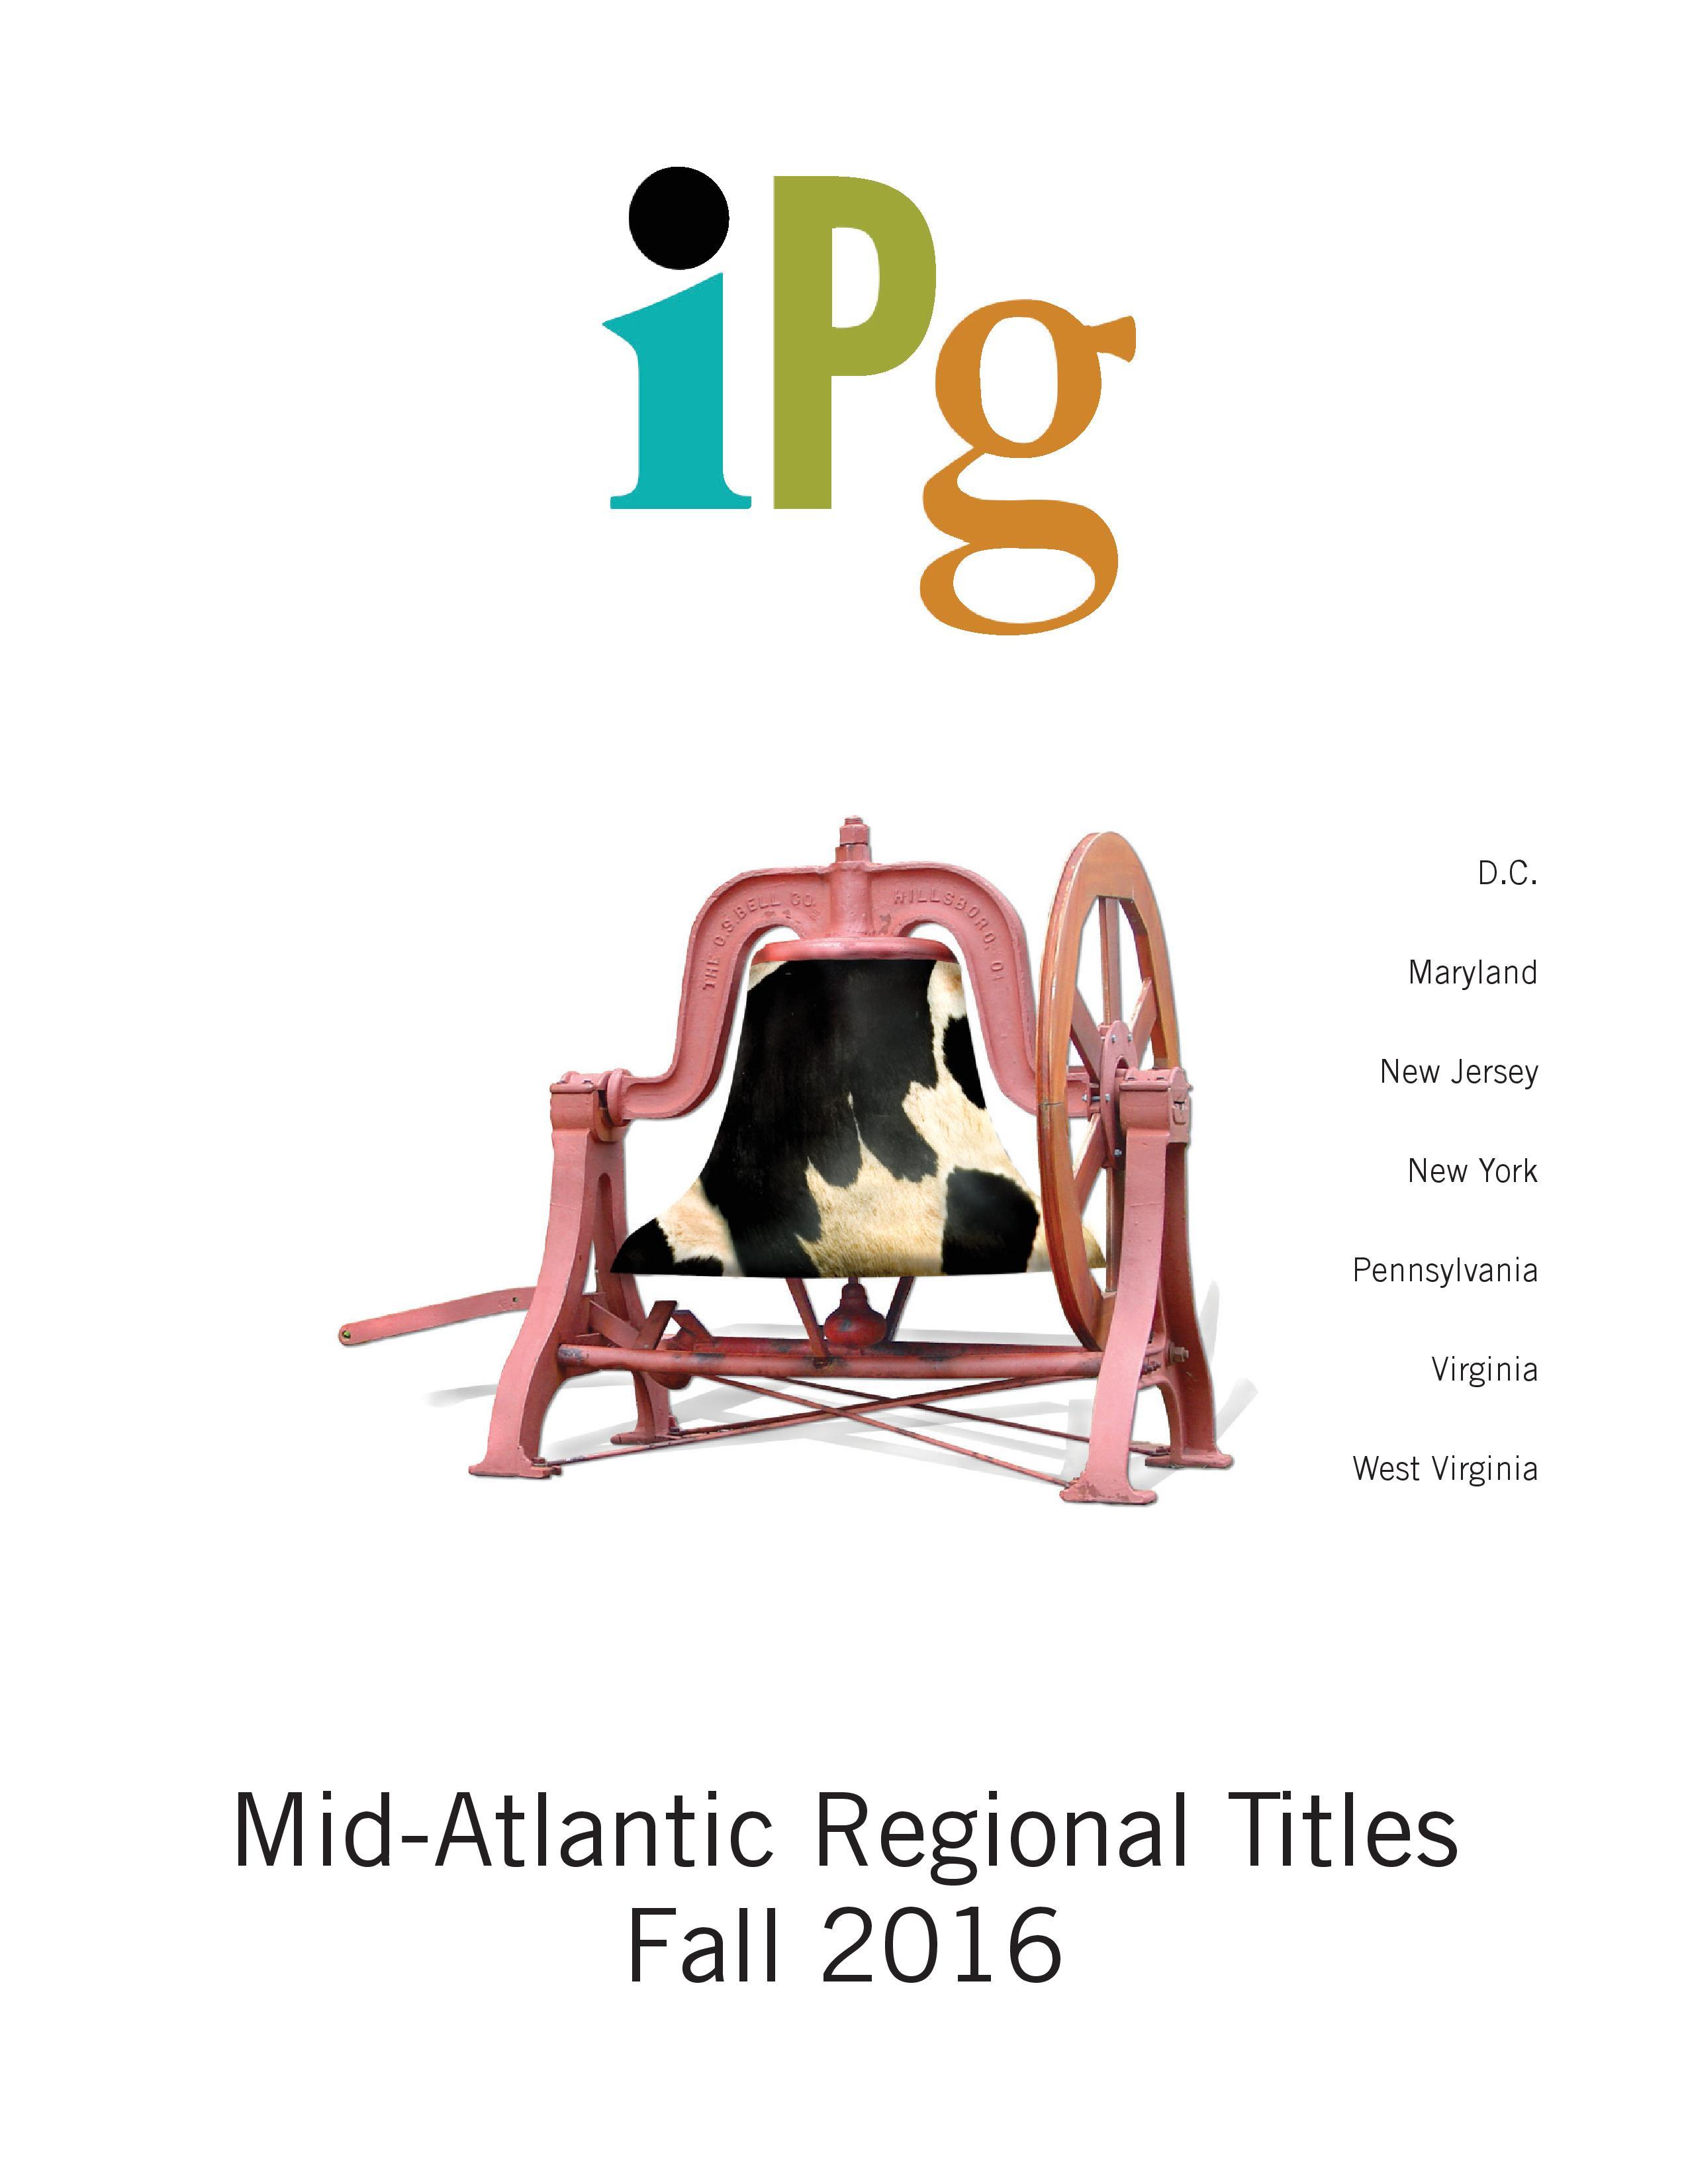 Mid-Atlantic Regional Titles